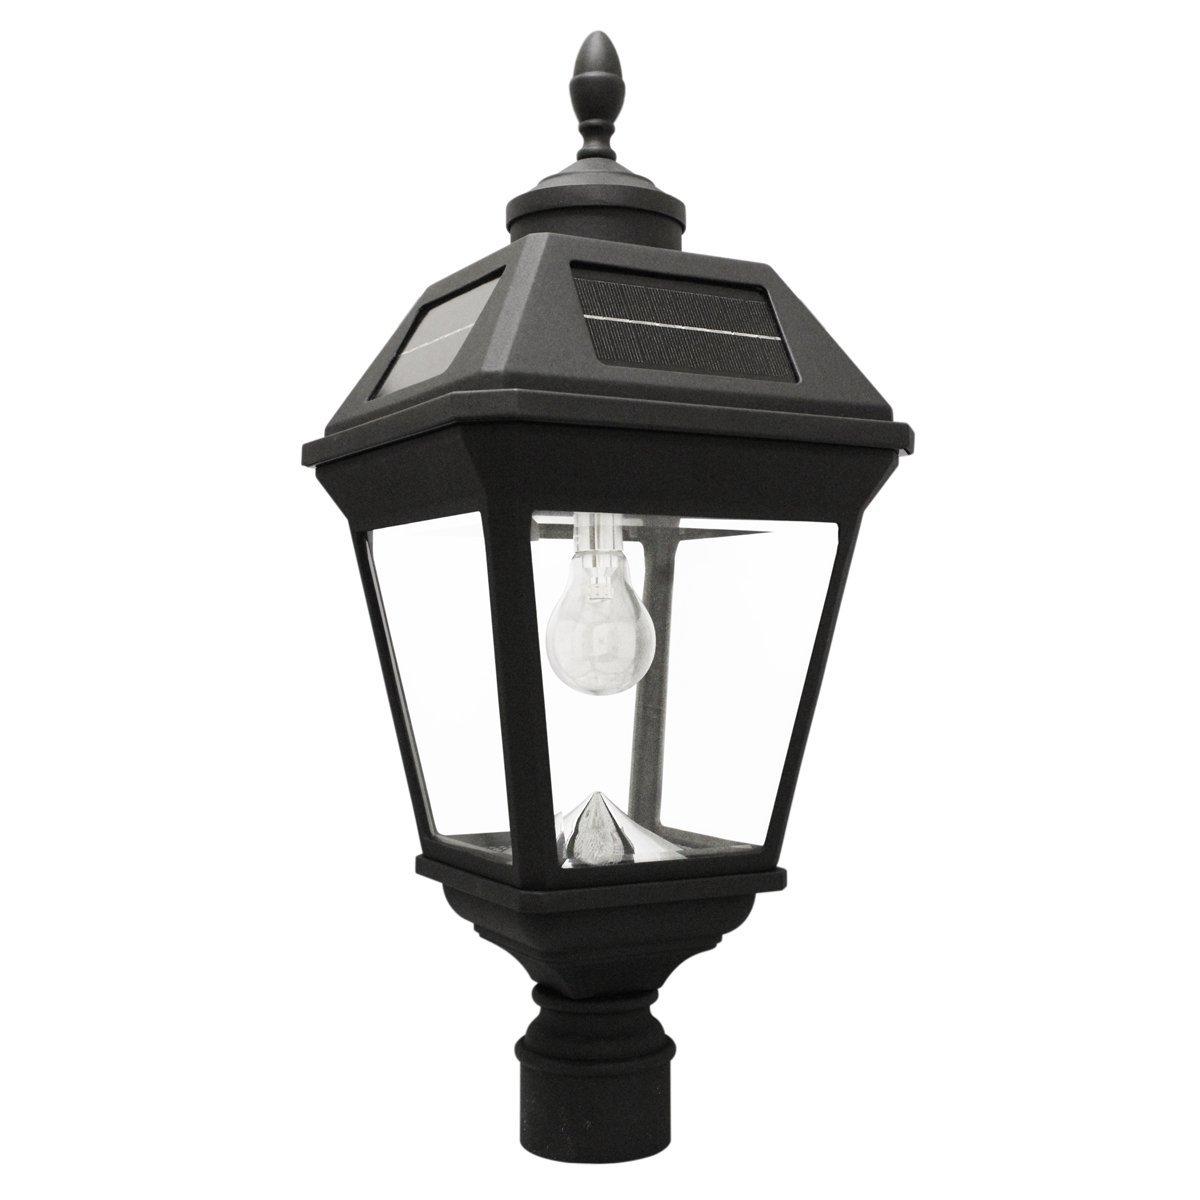 Gama Sonic Imperial Bulb Solar Outdoor Post Light GS-97B-F - Black Finish